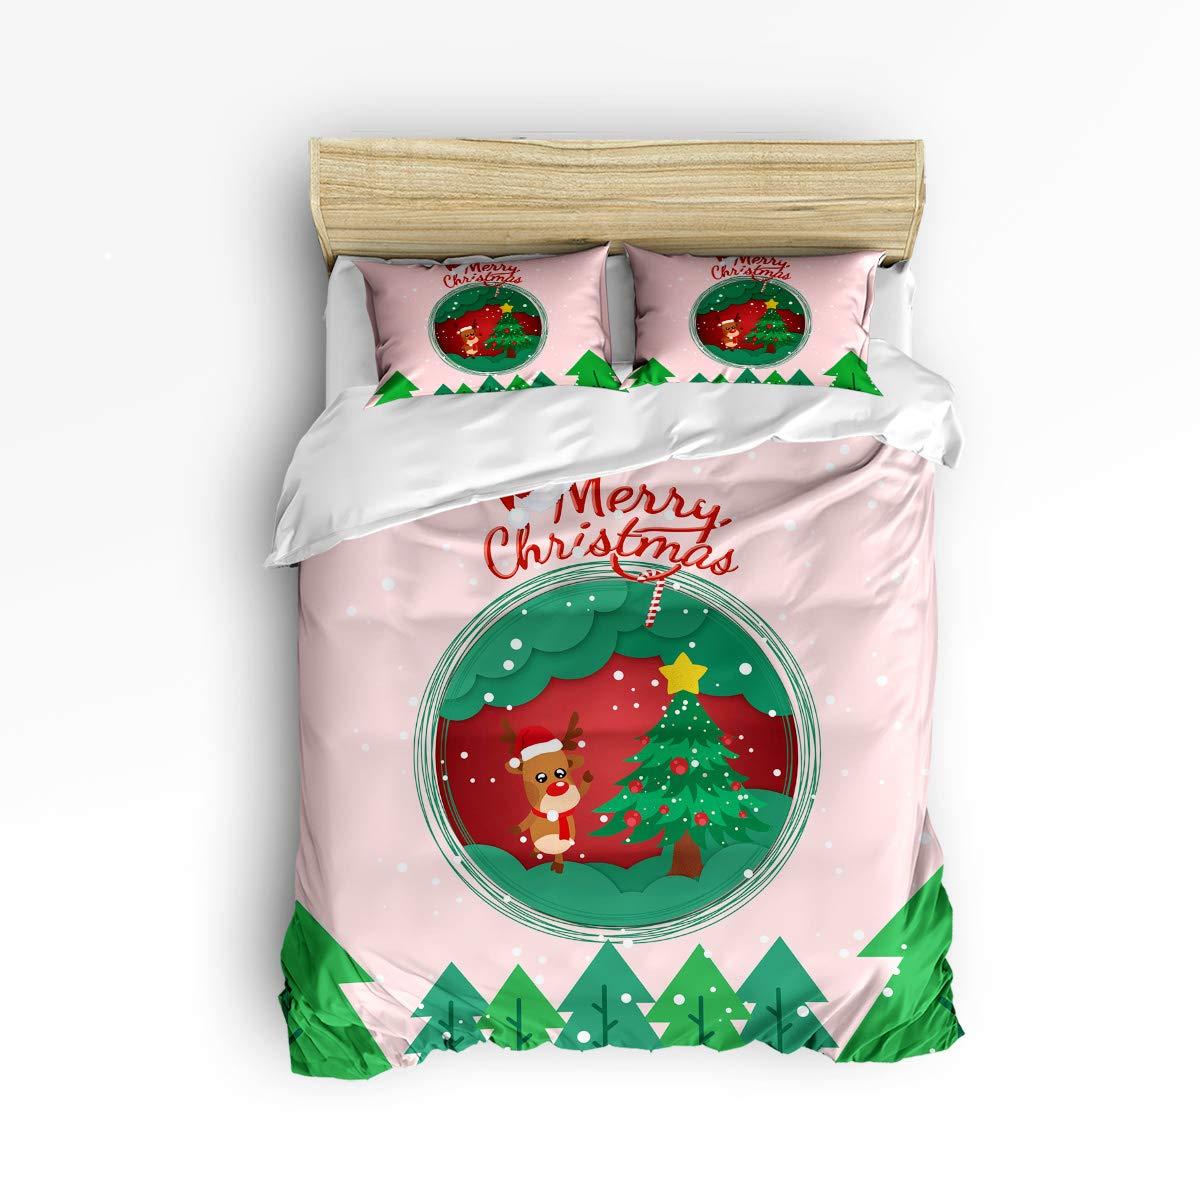 NewThangKa 3ピース寝具セット – 1ソフトダウン掛け布団キルト寝具カバーマッチング2枕カバーとジッパー開閉、レッドローズは愛の寝具布団カバーセット Twin Size WSJ-181122-3pcsets-SWTQ00401SJSANTK B07L84LMY6 Christmasmooseelkntk4611 Twin Size